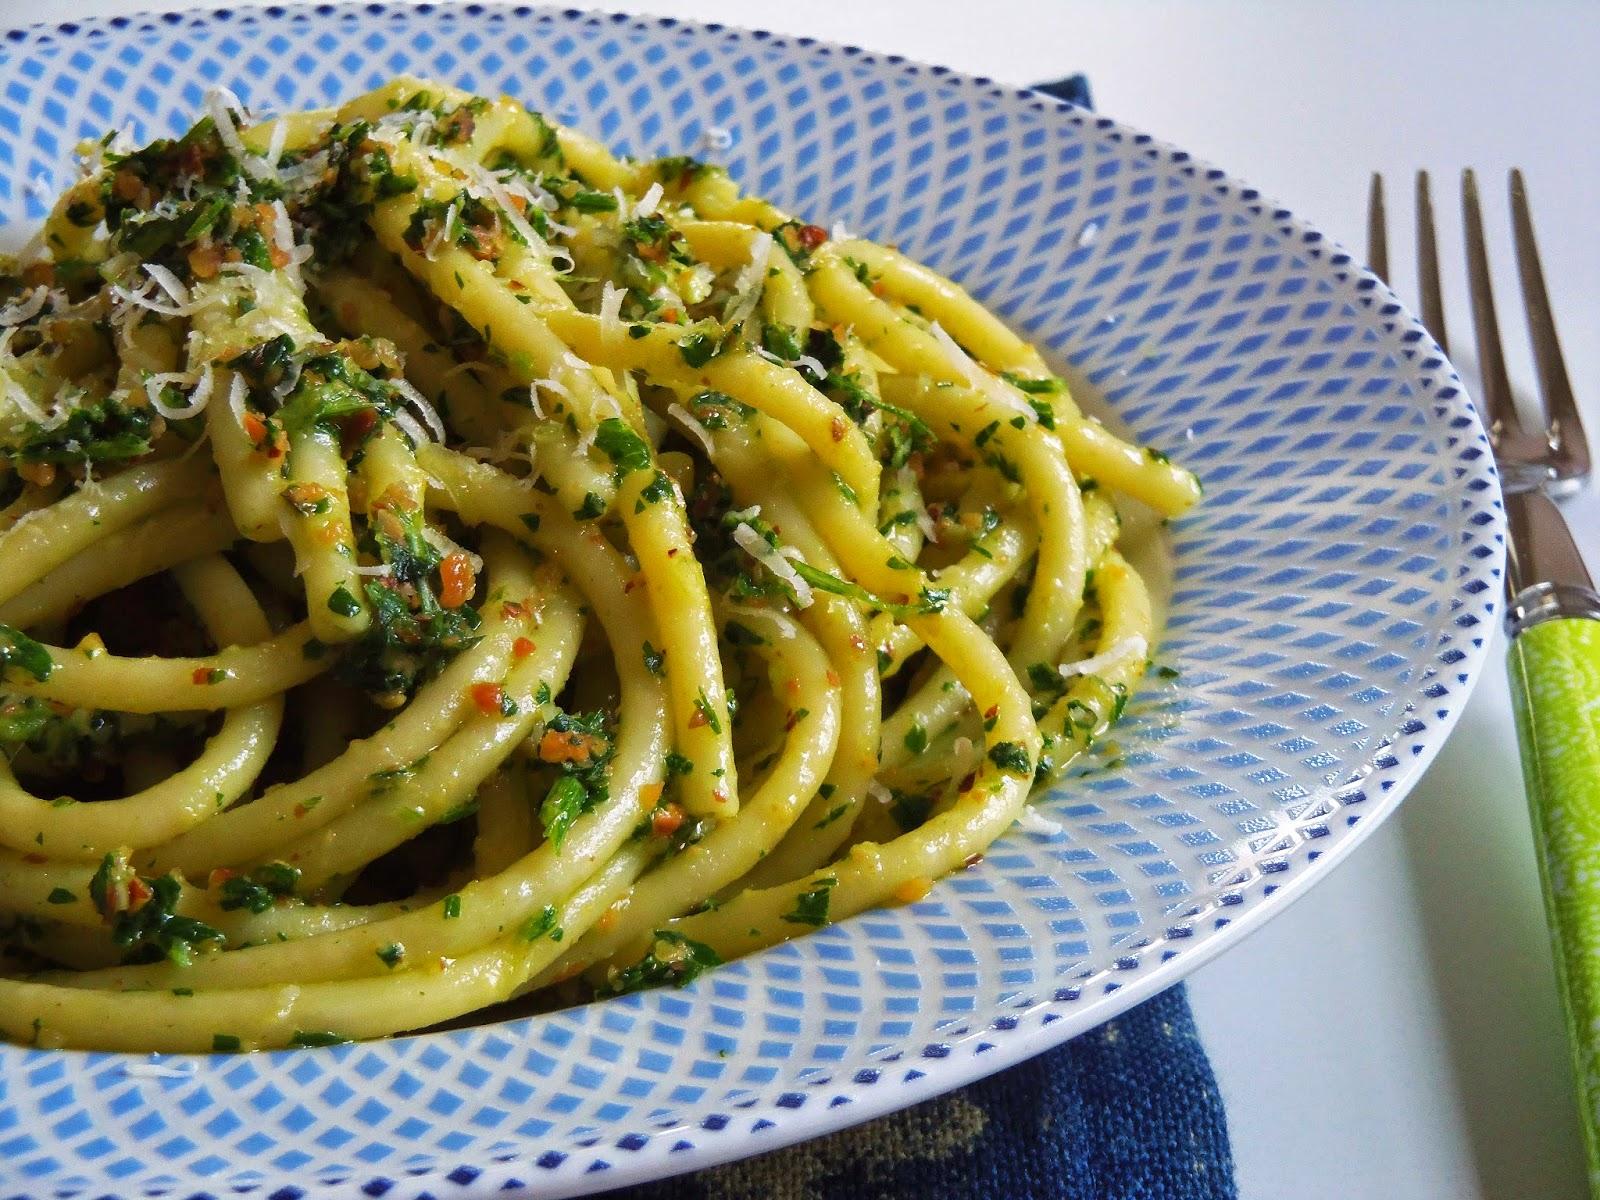 Simply Romanesco: Spaghetti with Parsley Pesto